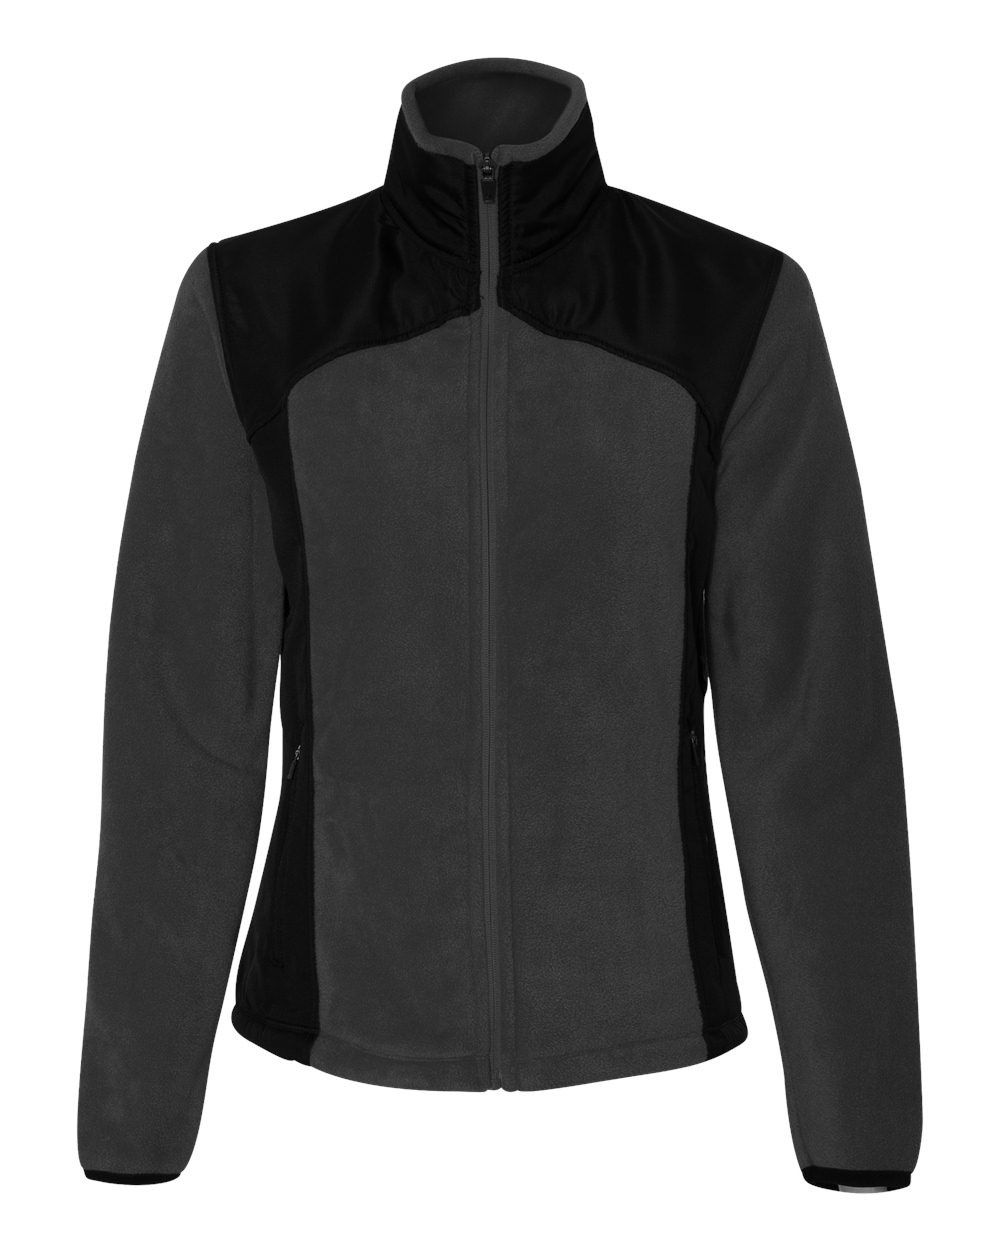 Colorado Clothing - Ladies' Telluride Nylon/Polarfleece Jacket - 7116 Charcoal/_black